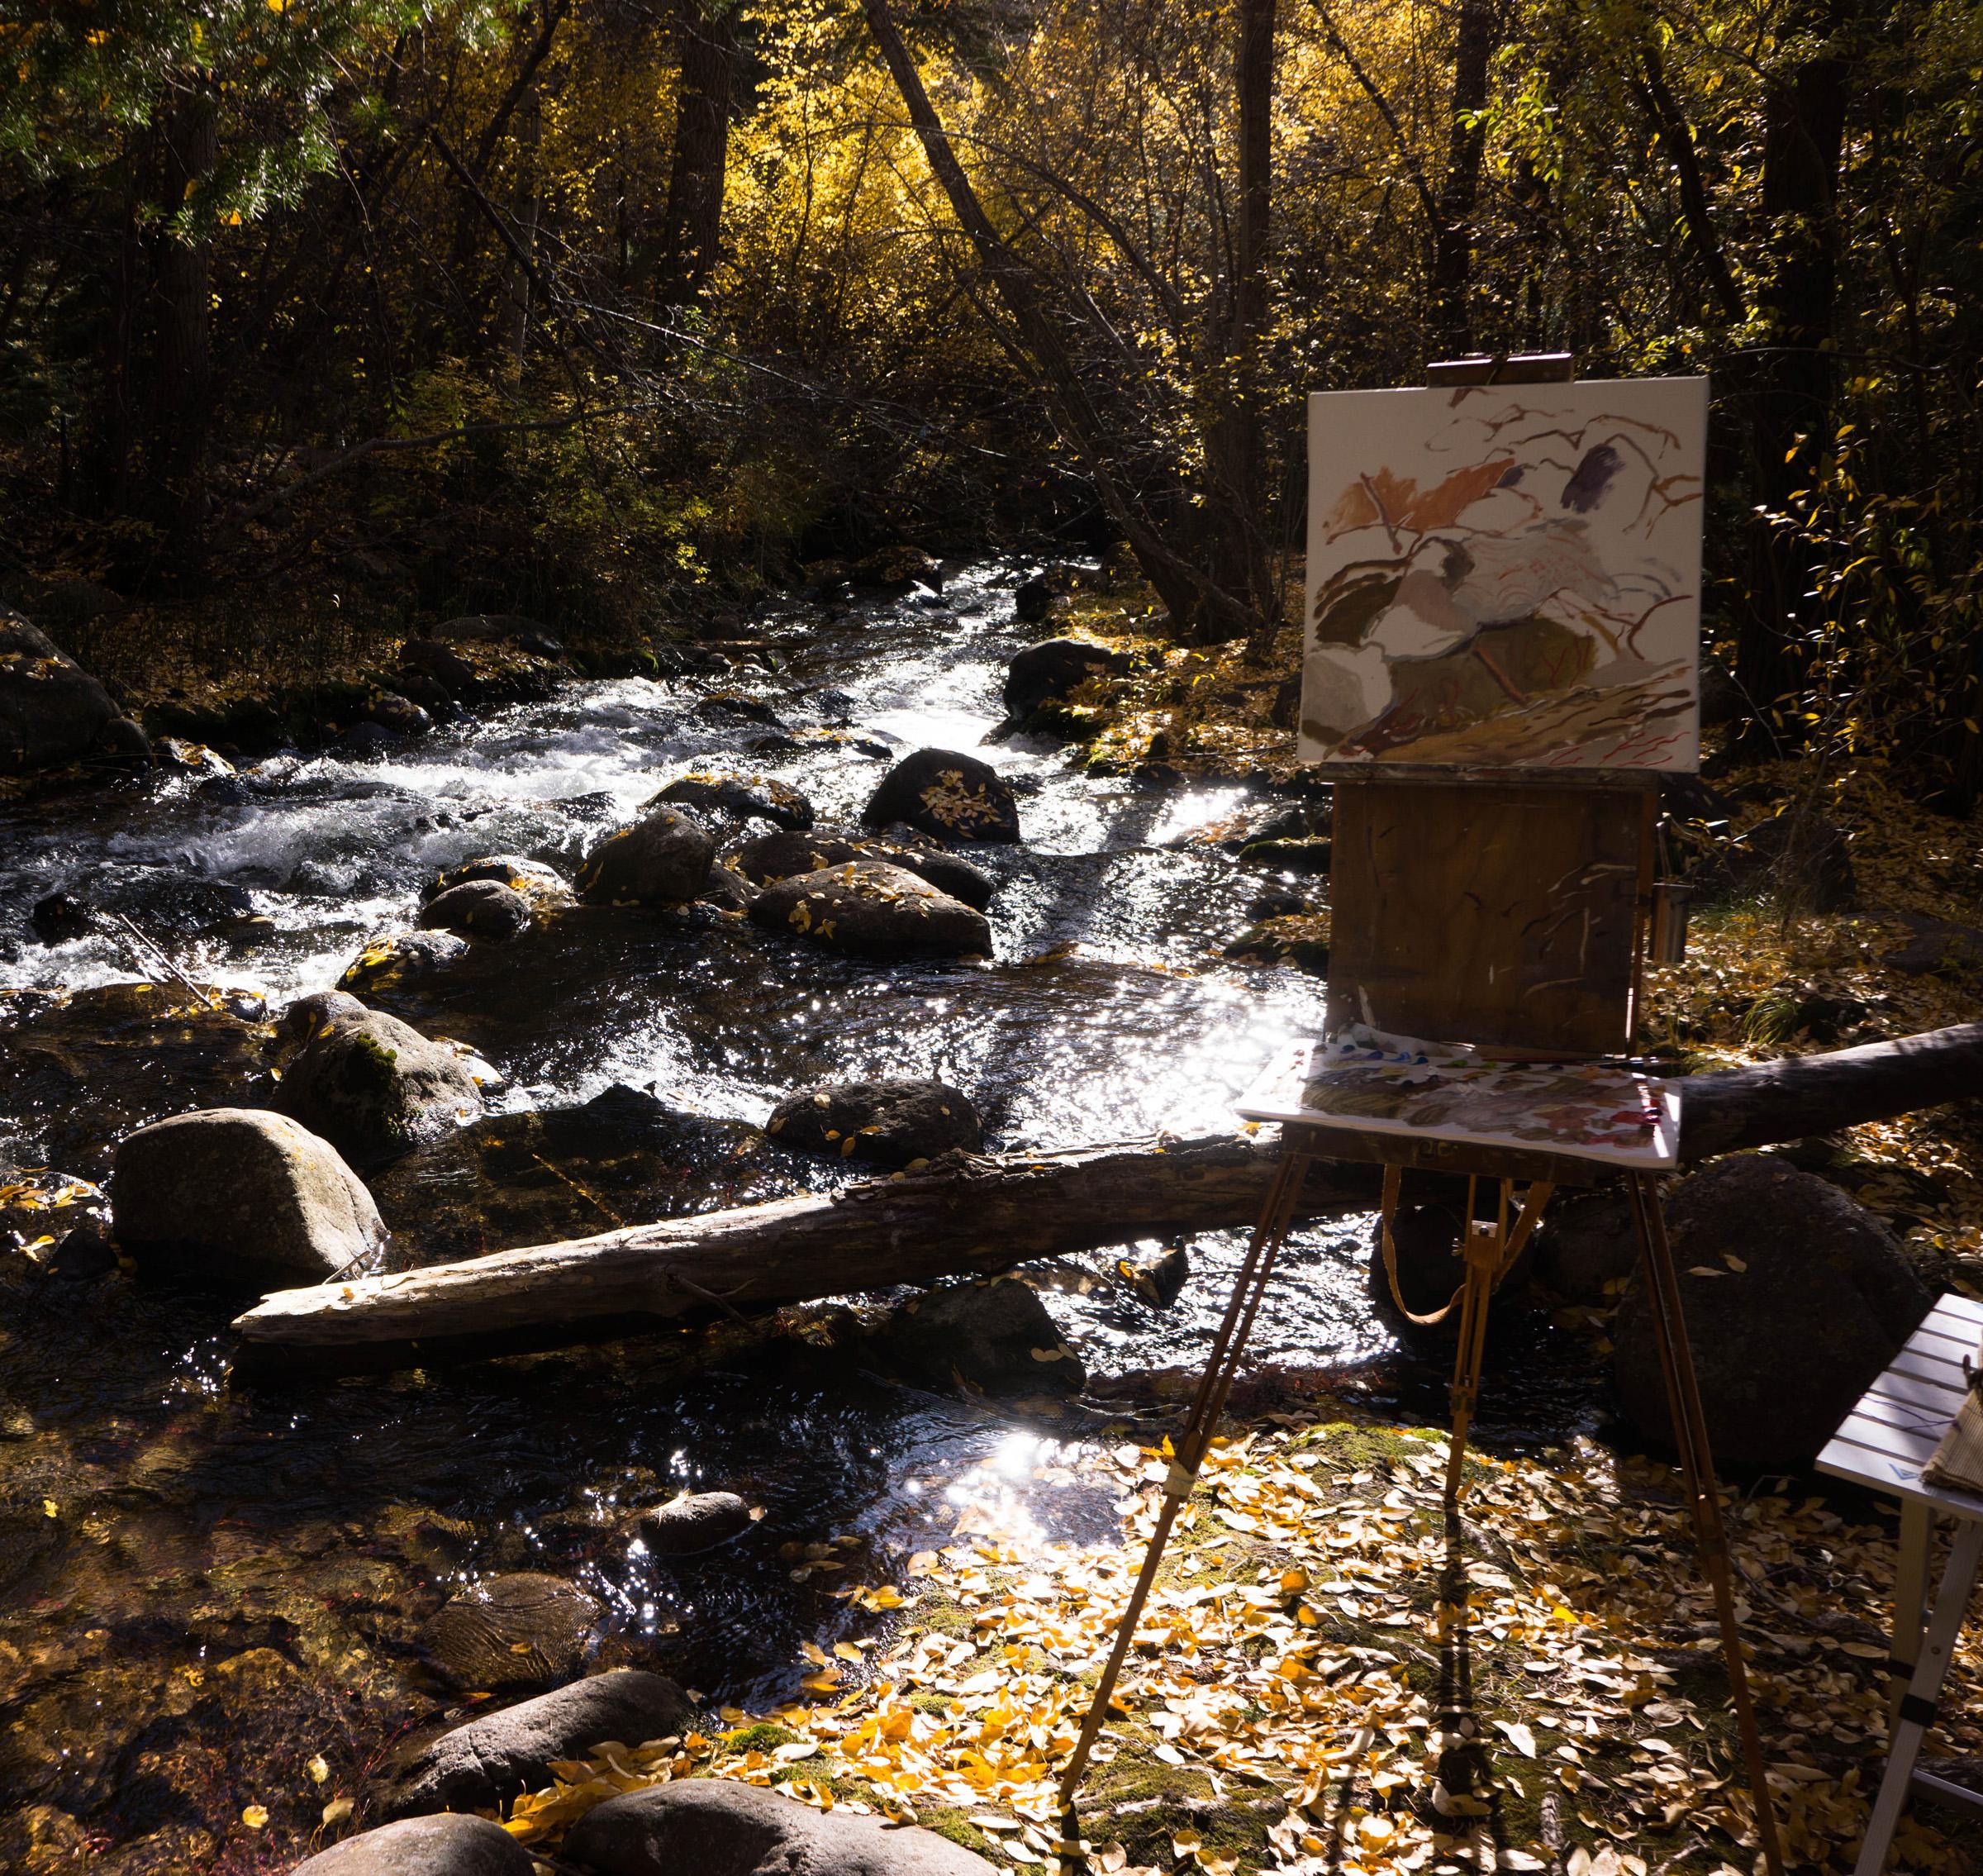 site-10-18-14 north crestone creek 2.jpg